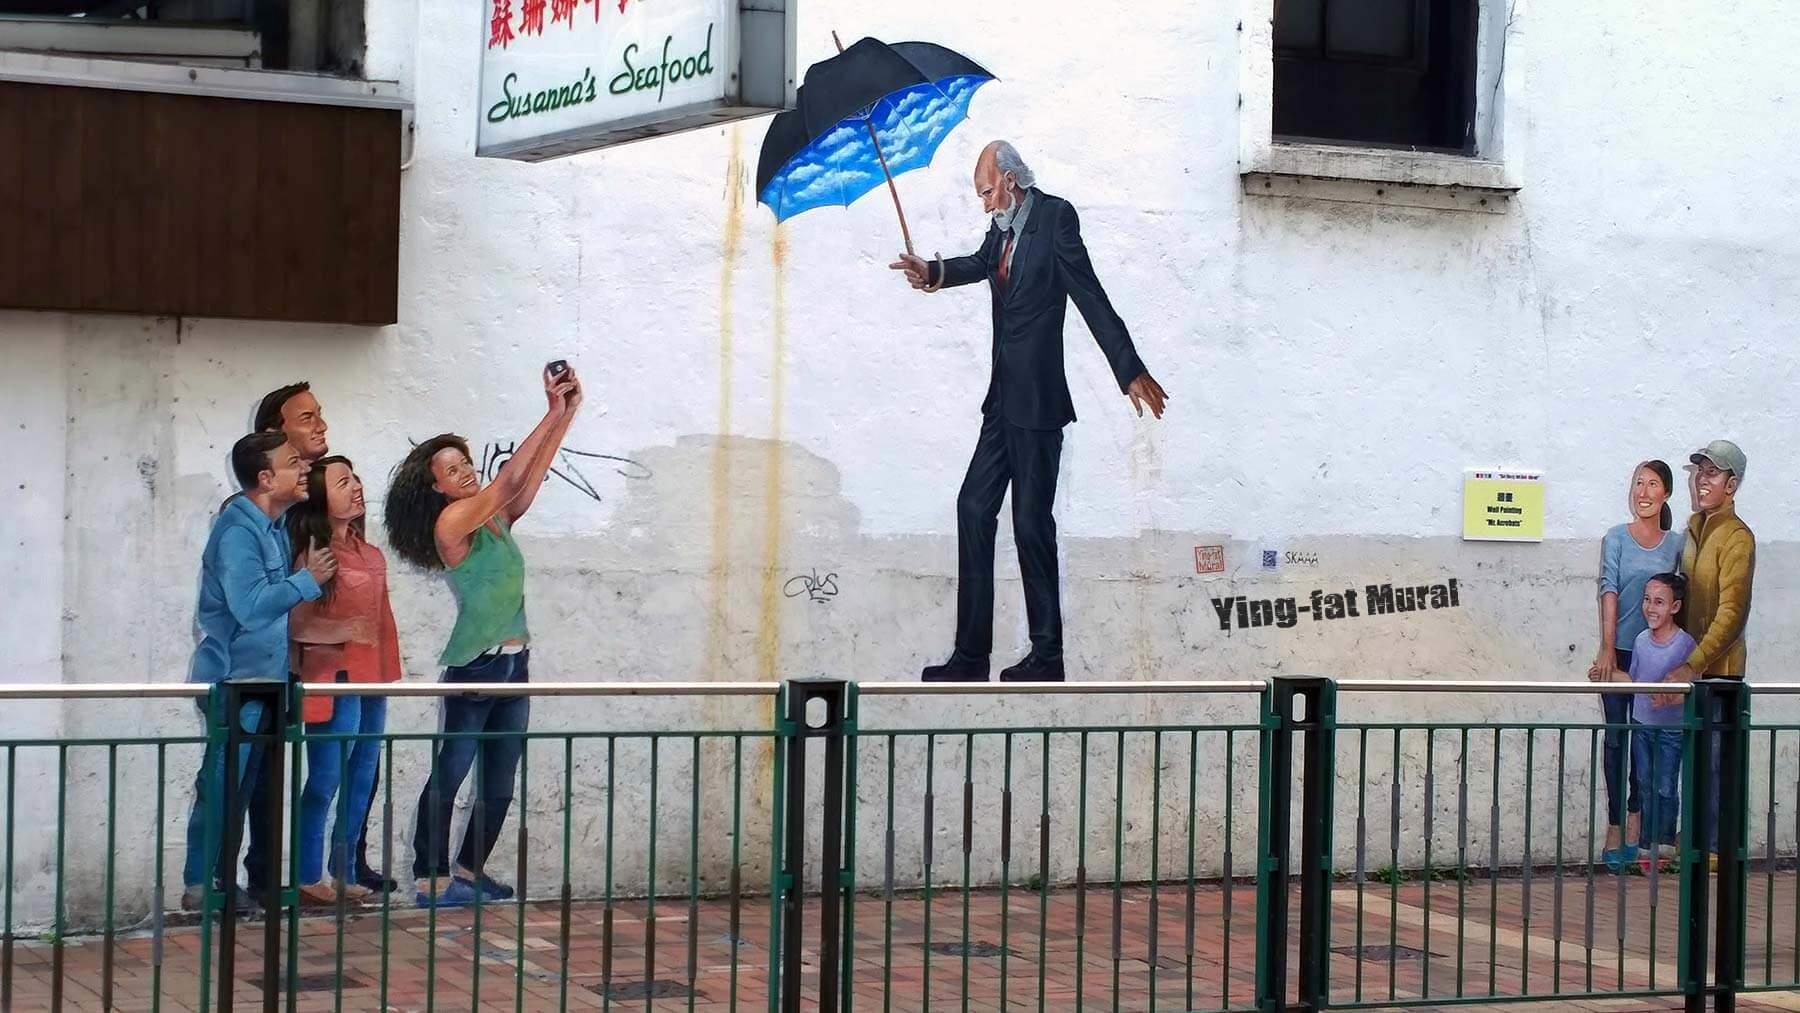 Hong Kong Mural Artist Ying-fat @ Man Lin Street, Sai Kung (西貢萬年街)